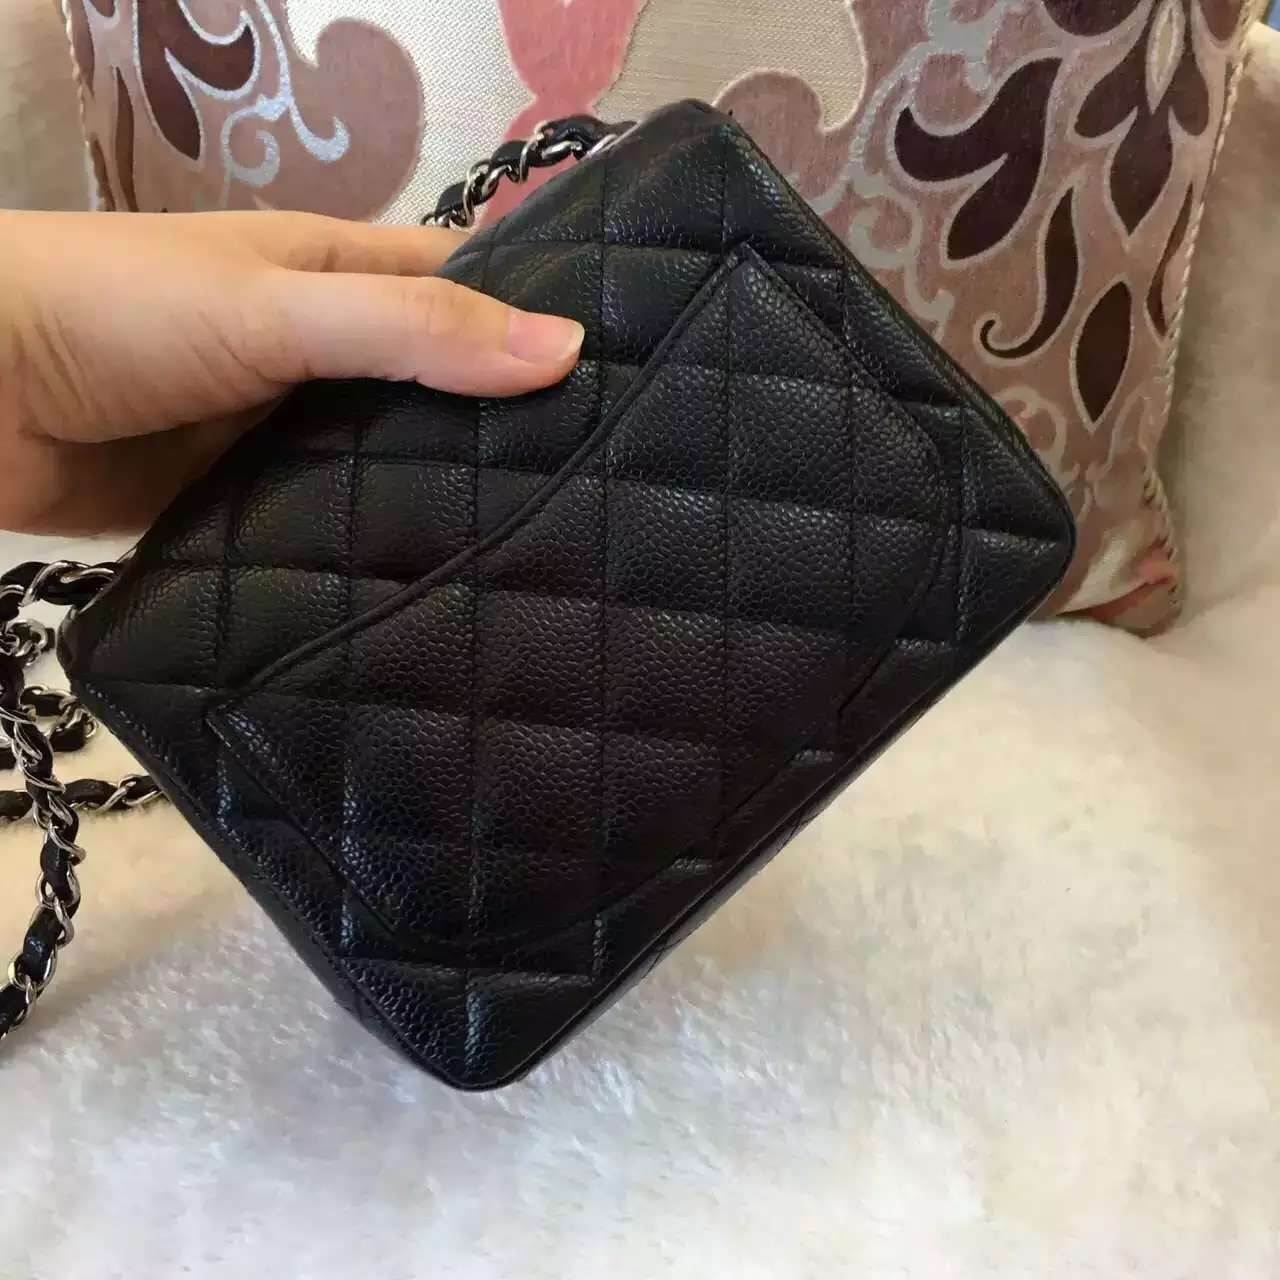 ef961a841b79 Authentic CHANEL Classic Square Mini Flap Bag Black Caviar SIlver Hardware